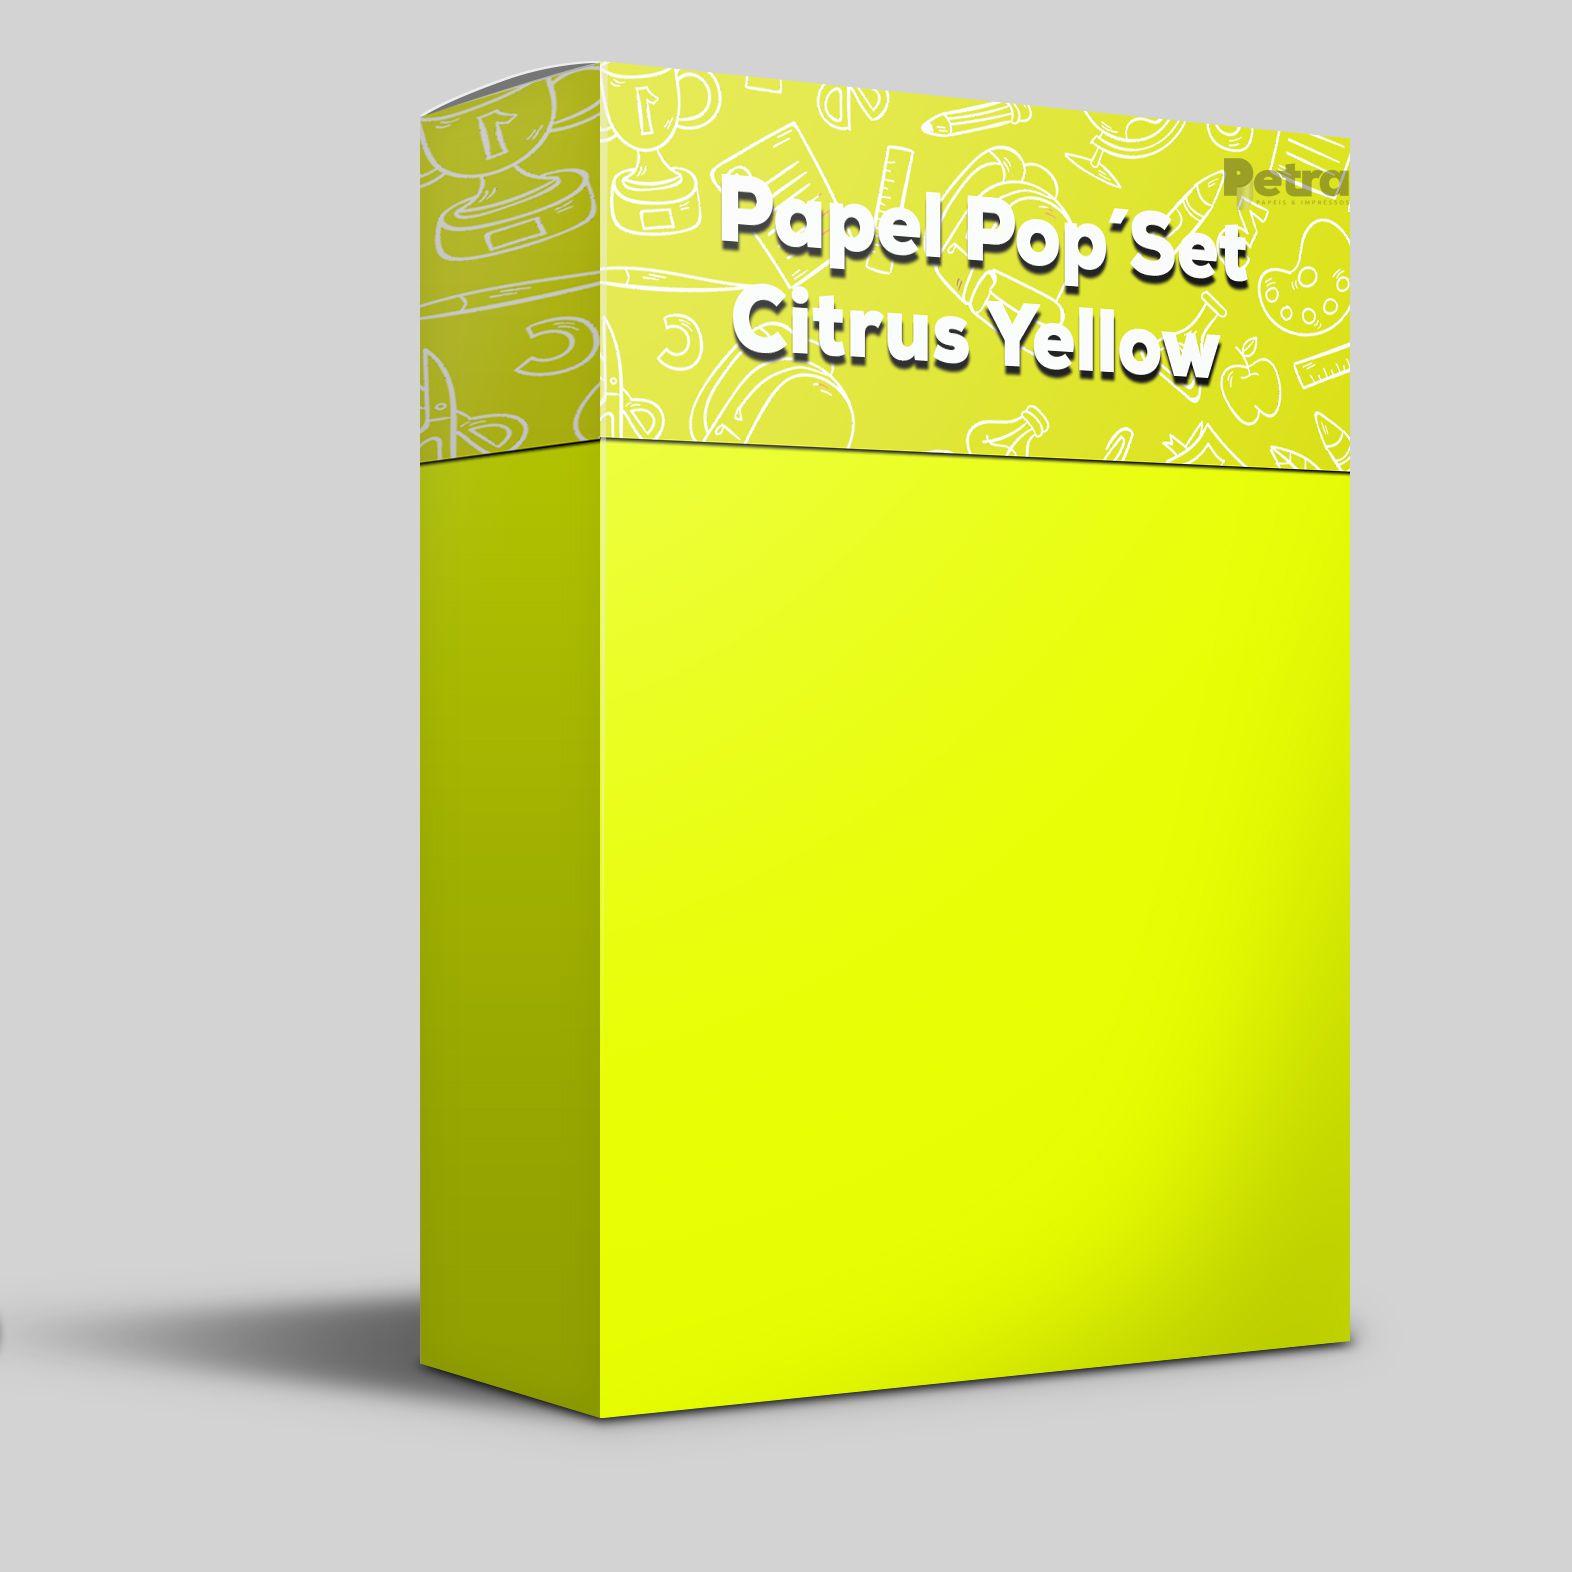 Pop Set Citrus Yellow ( amarelo )  - Tam. A4 -170g/m² - 20 folhas